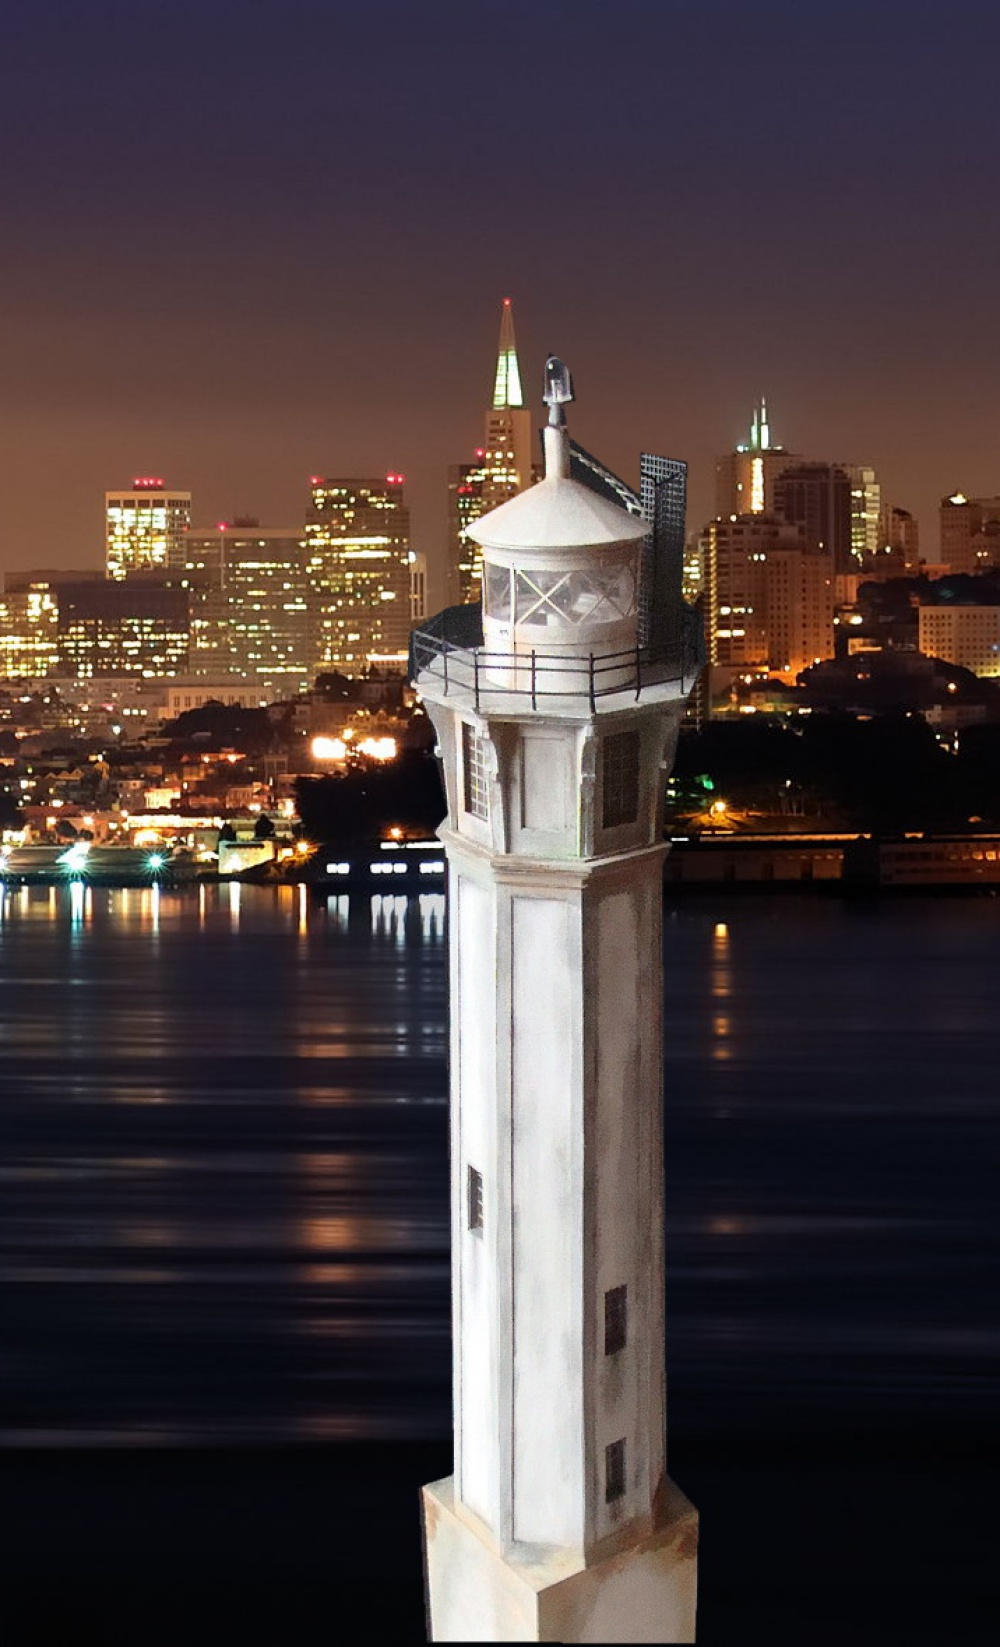 maják Alcatraz